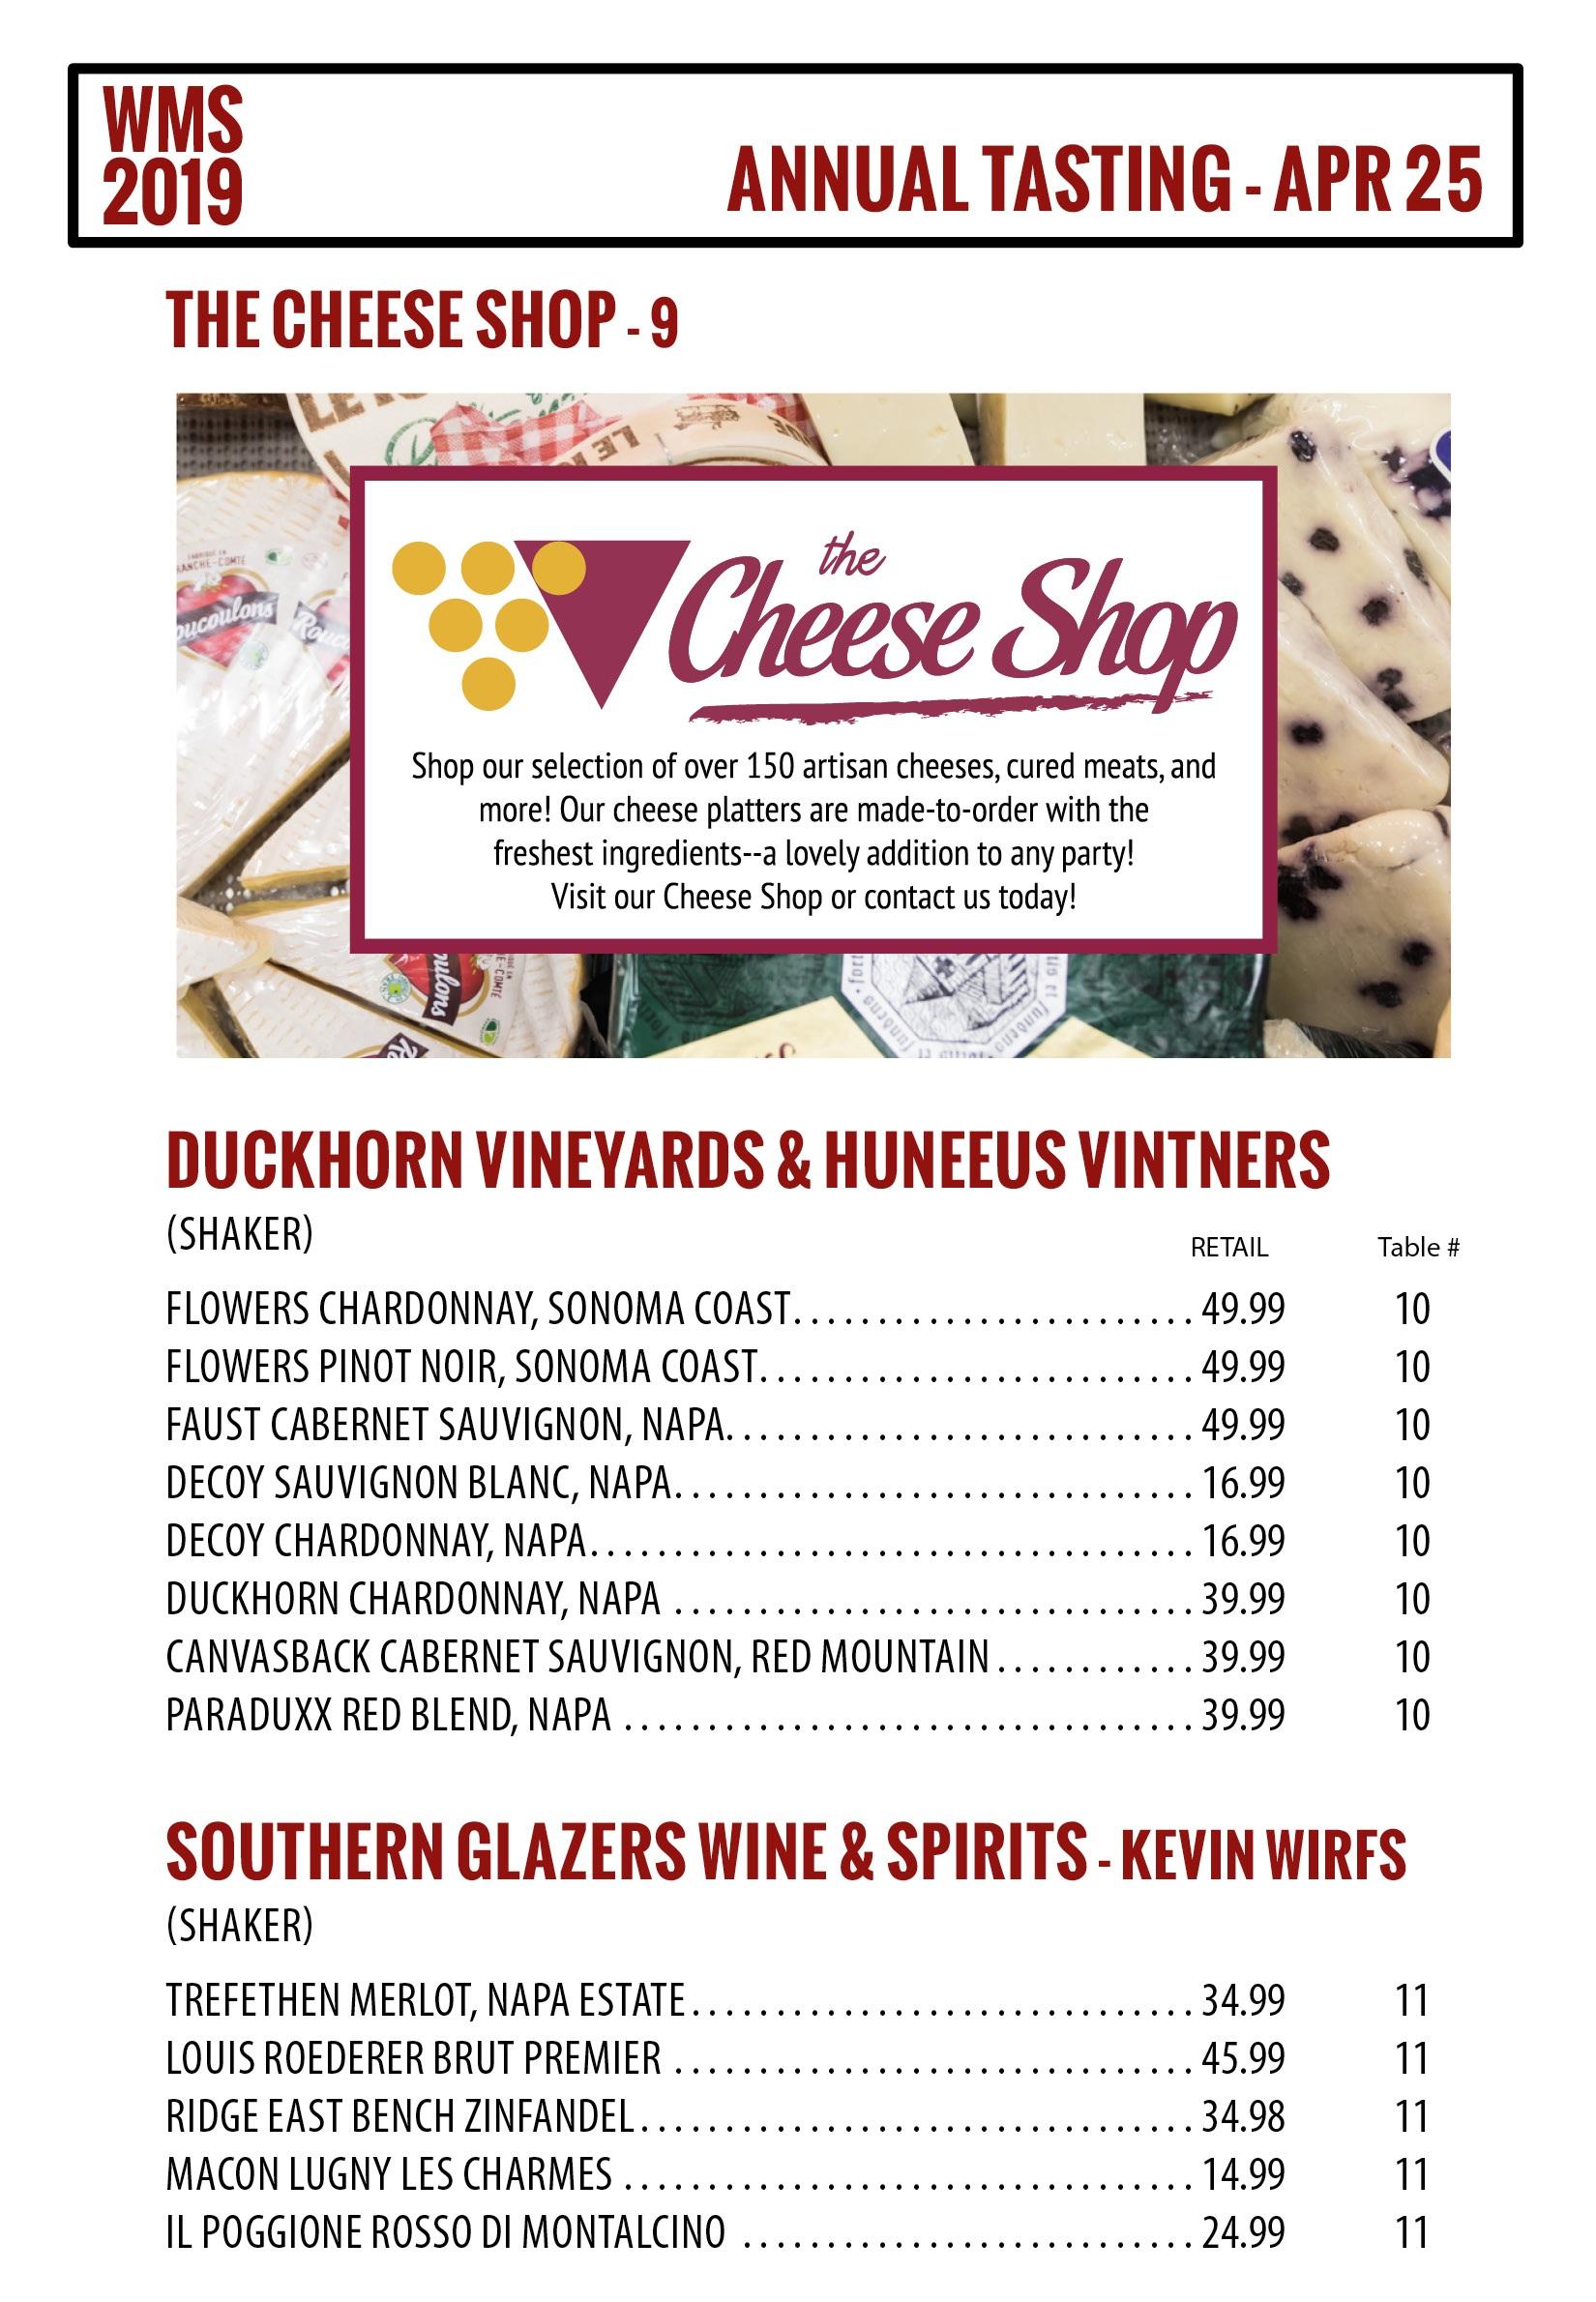 Winemakers+and+Shakers_Tasting+Guide_20195.jpg